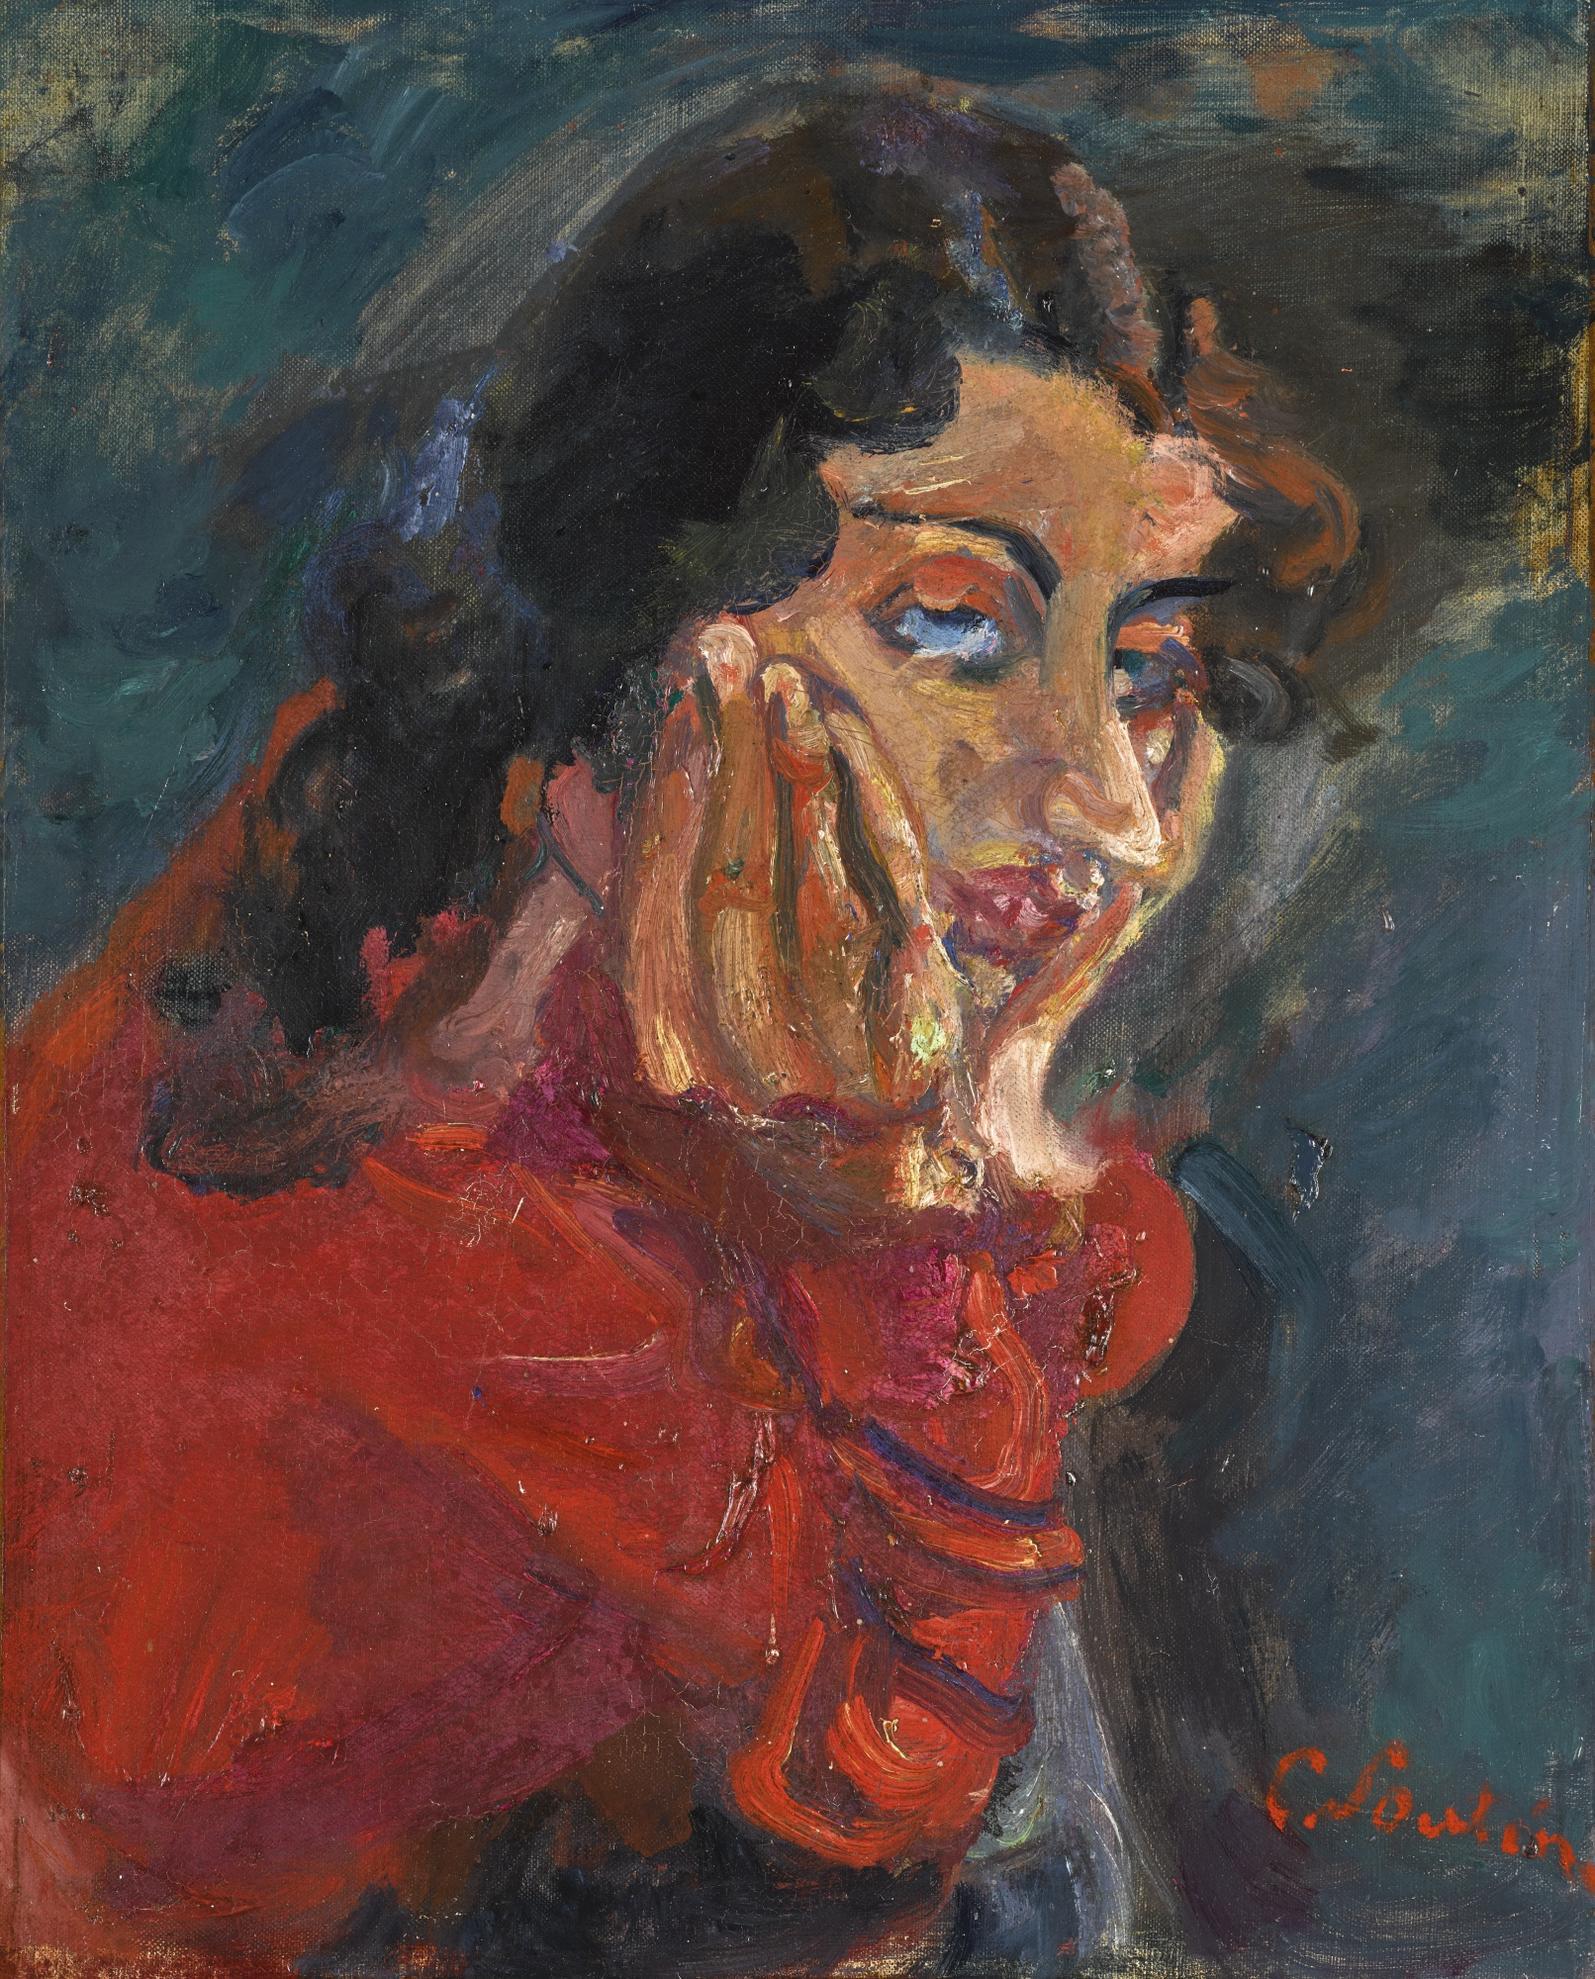 Chaim Soutine-La Femme Accoudee-1937